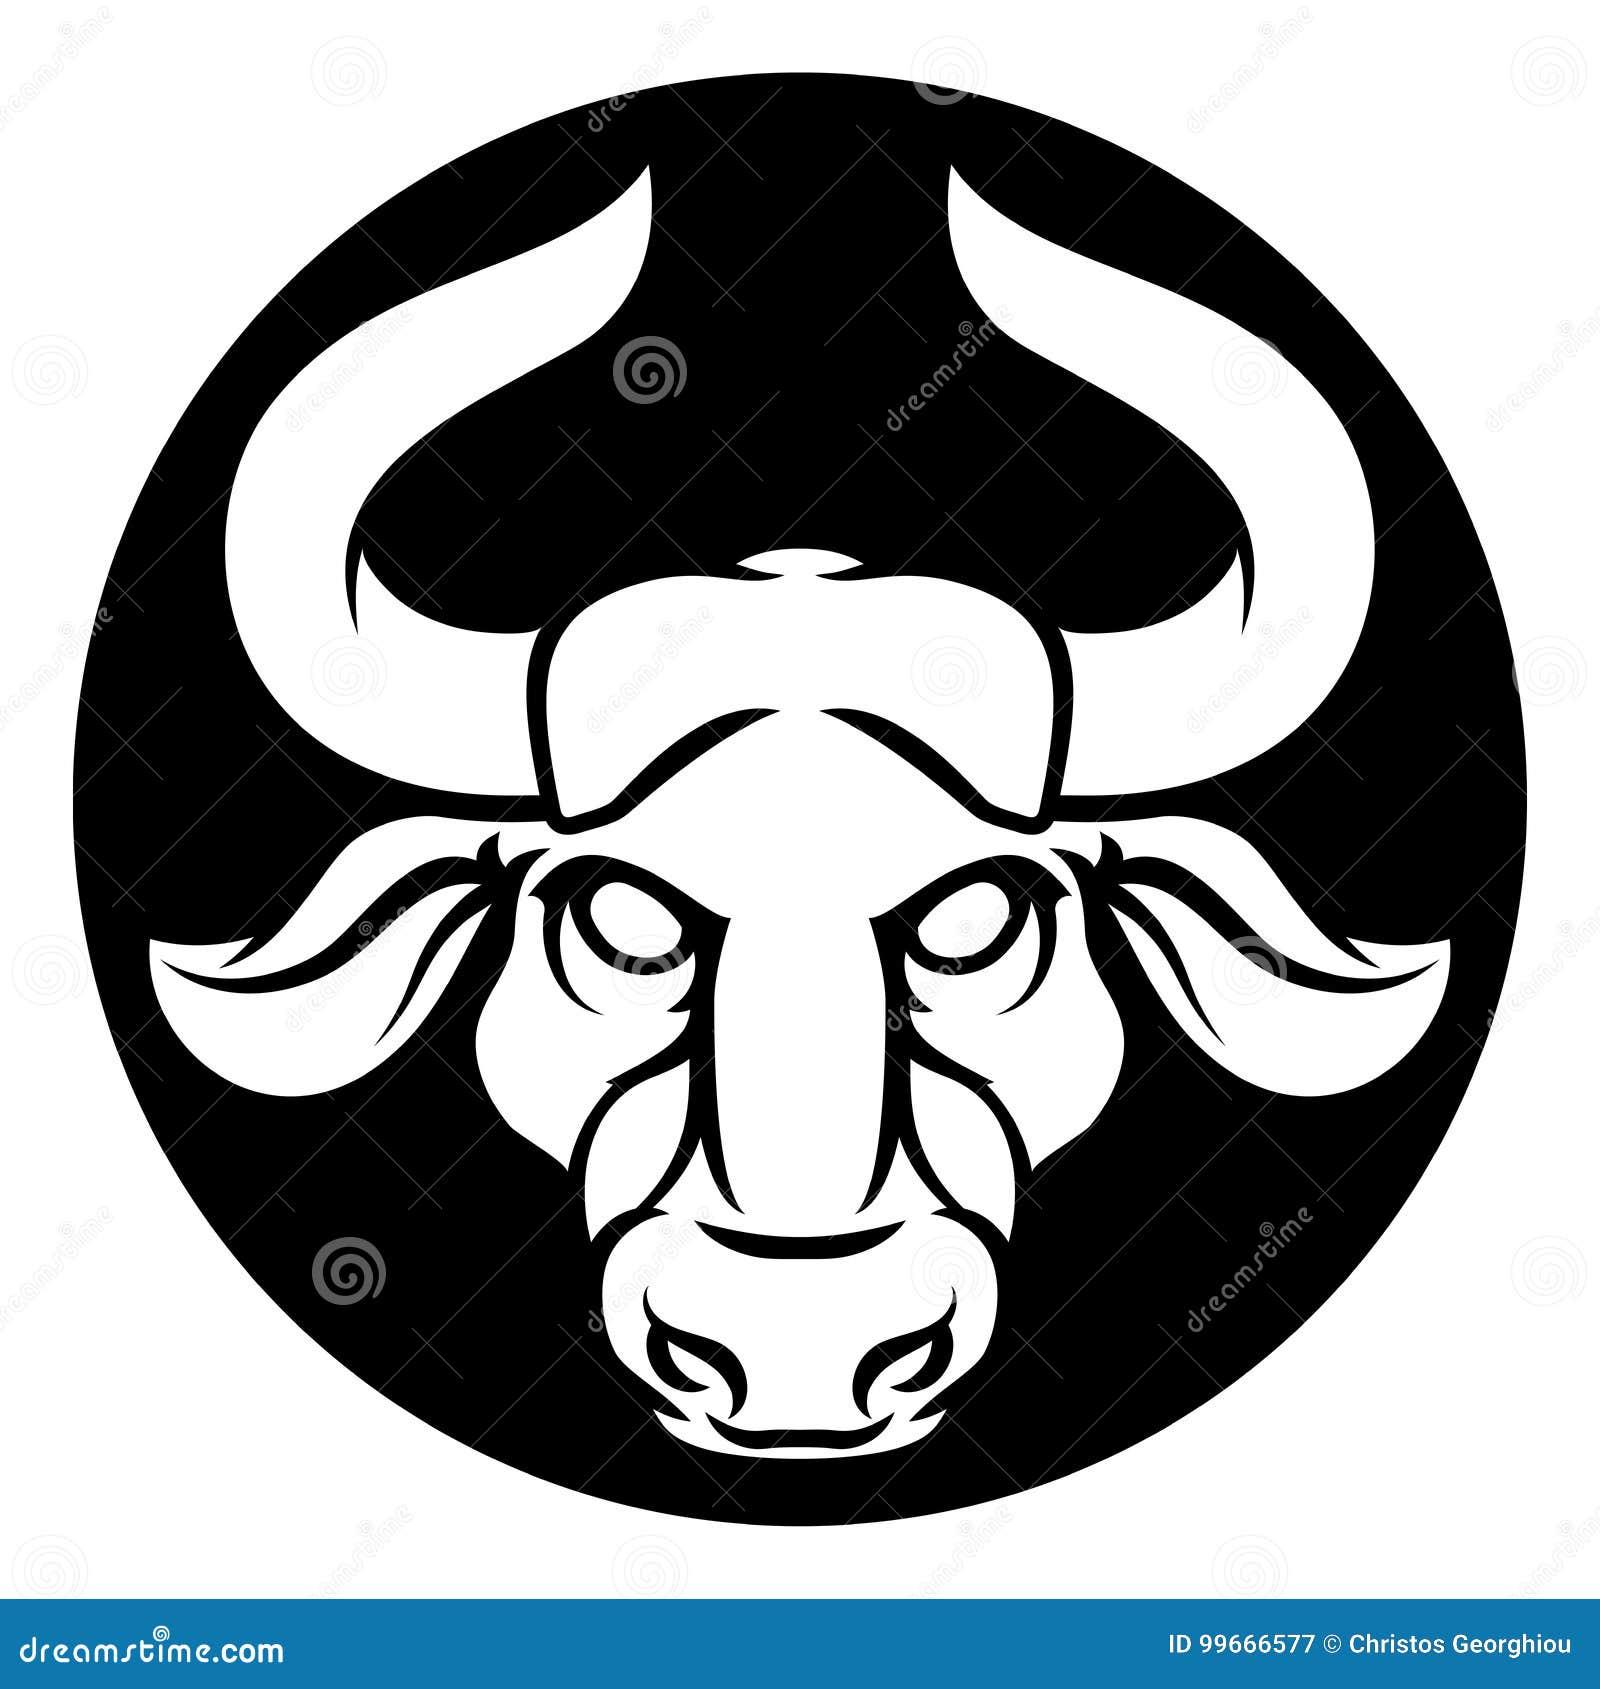 Taurus Bull Zodiac Astrology Sign Stock Vector Illustration Of